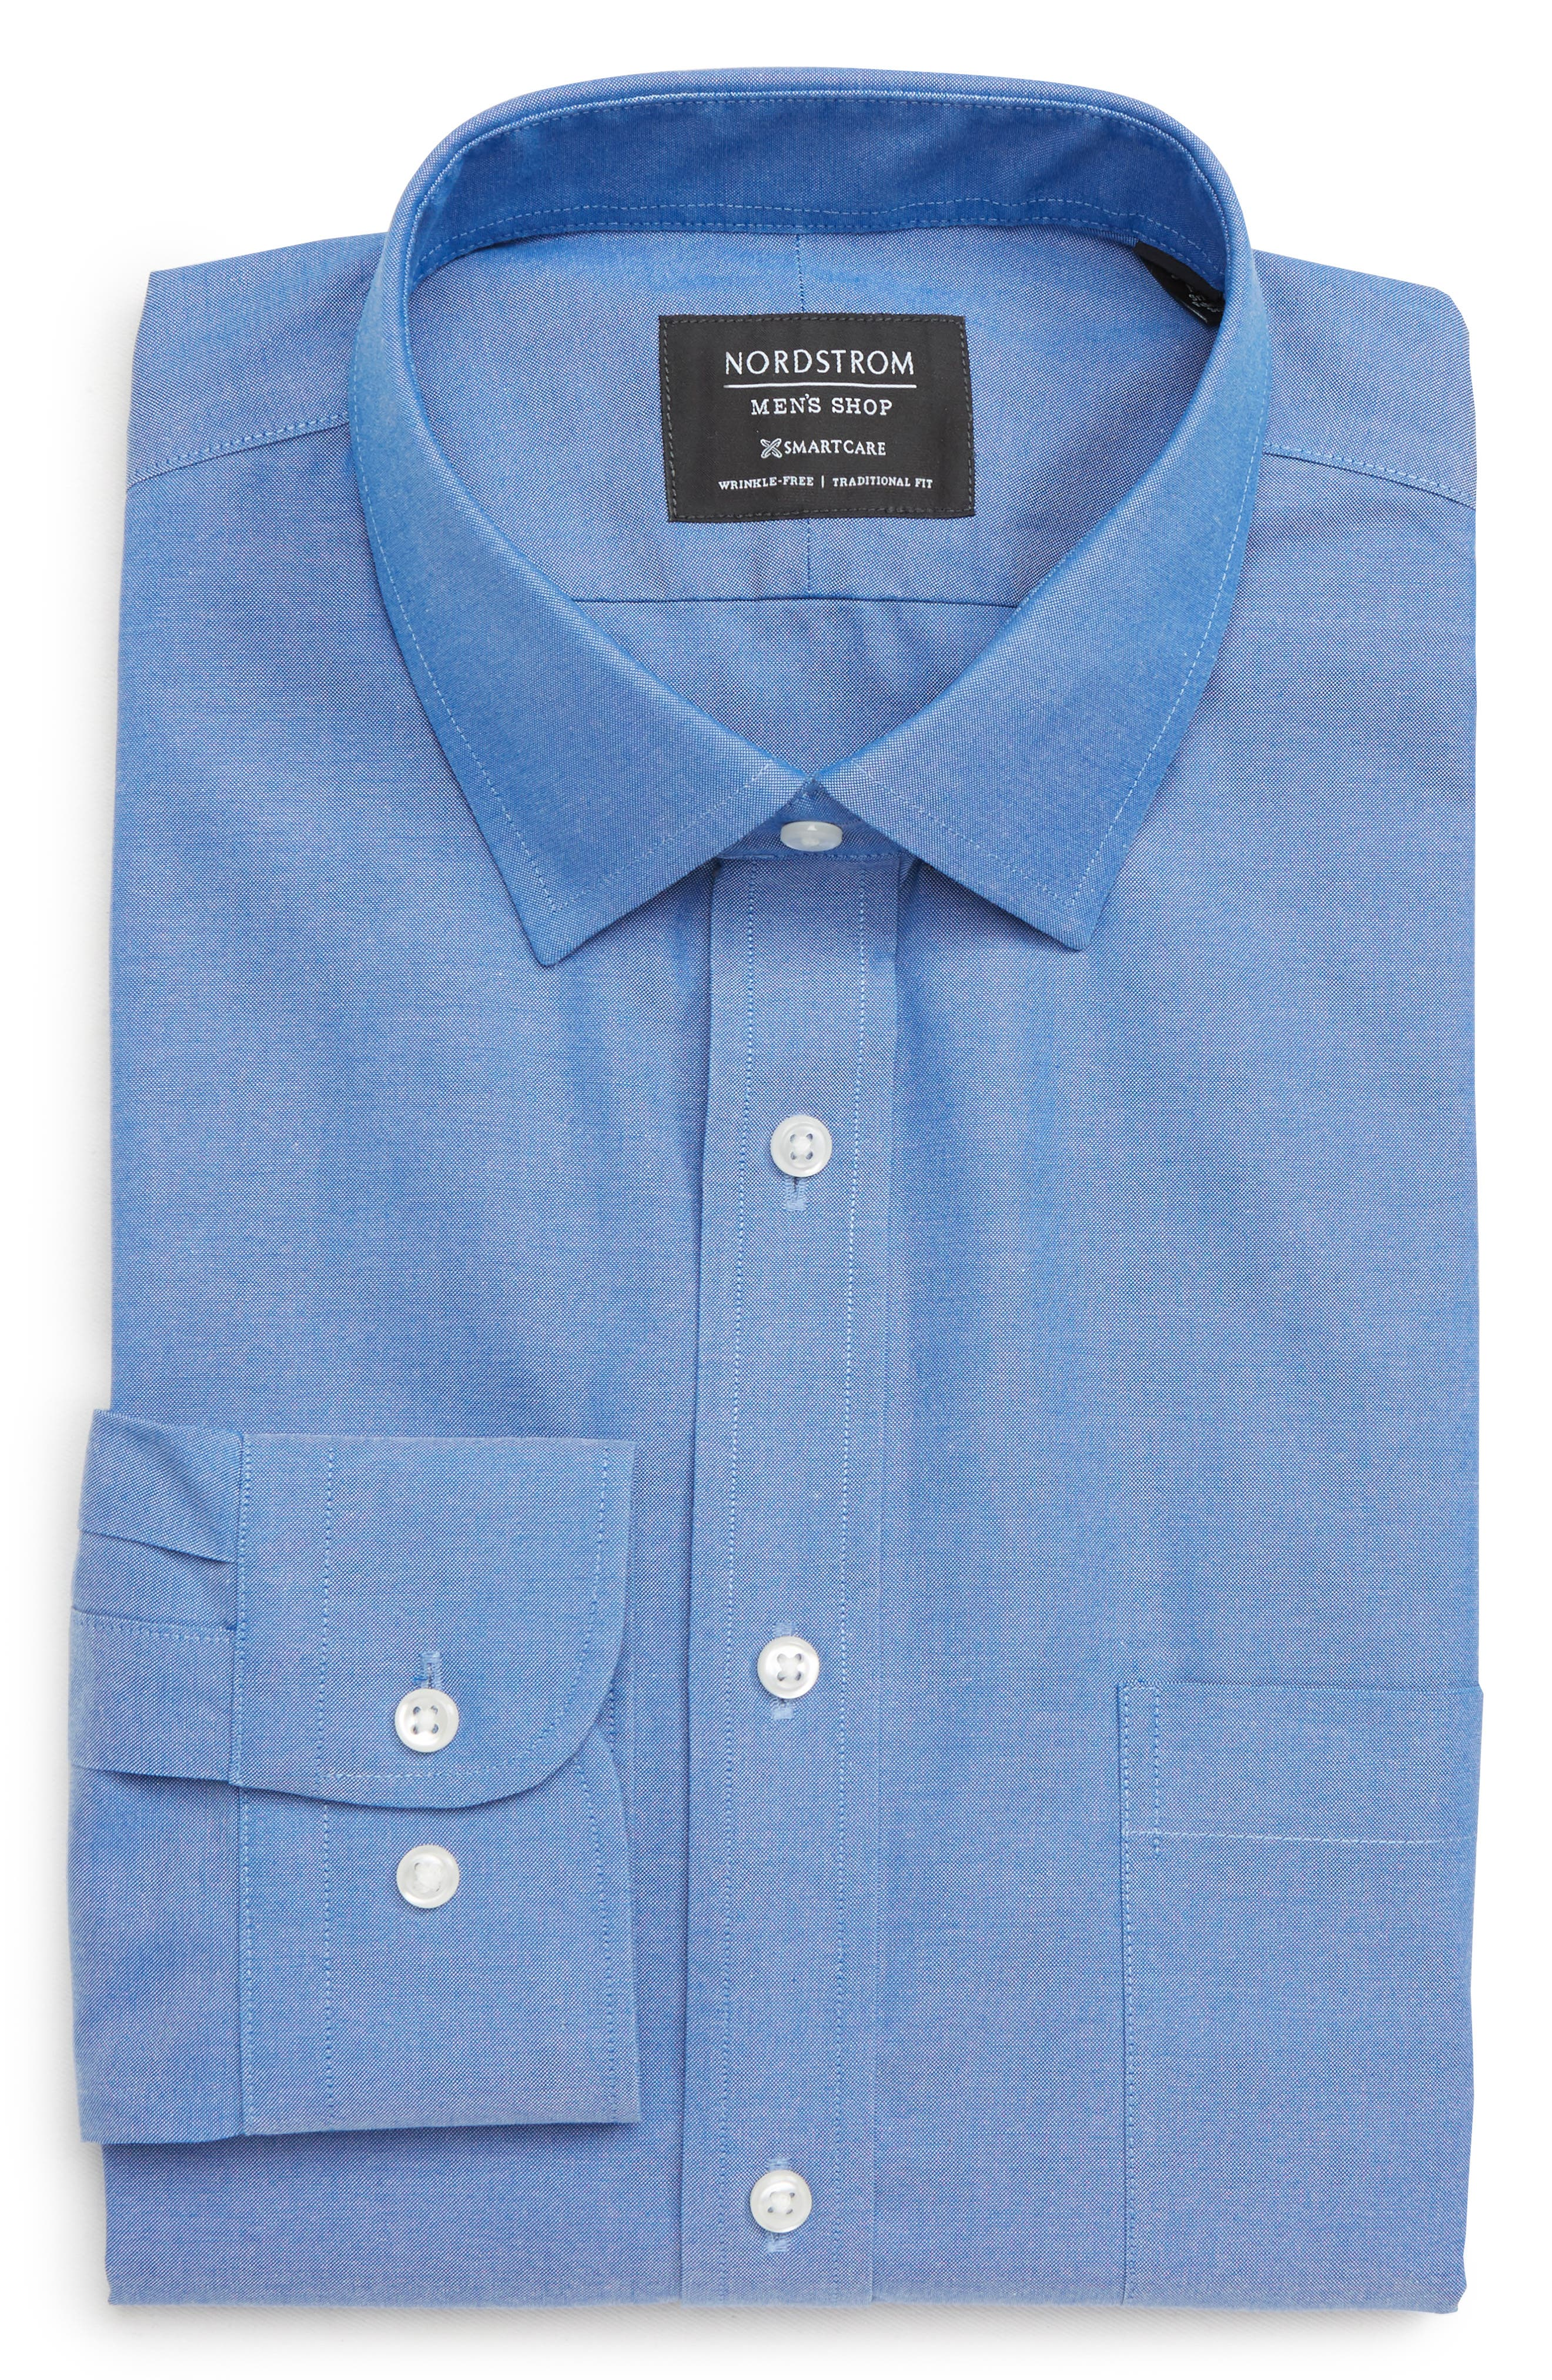 bfd9456d5b82 Nordstrom Shop Smartcare(TM) Traditional Fit Dress Shirt - Blue